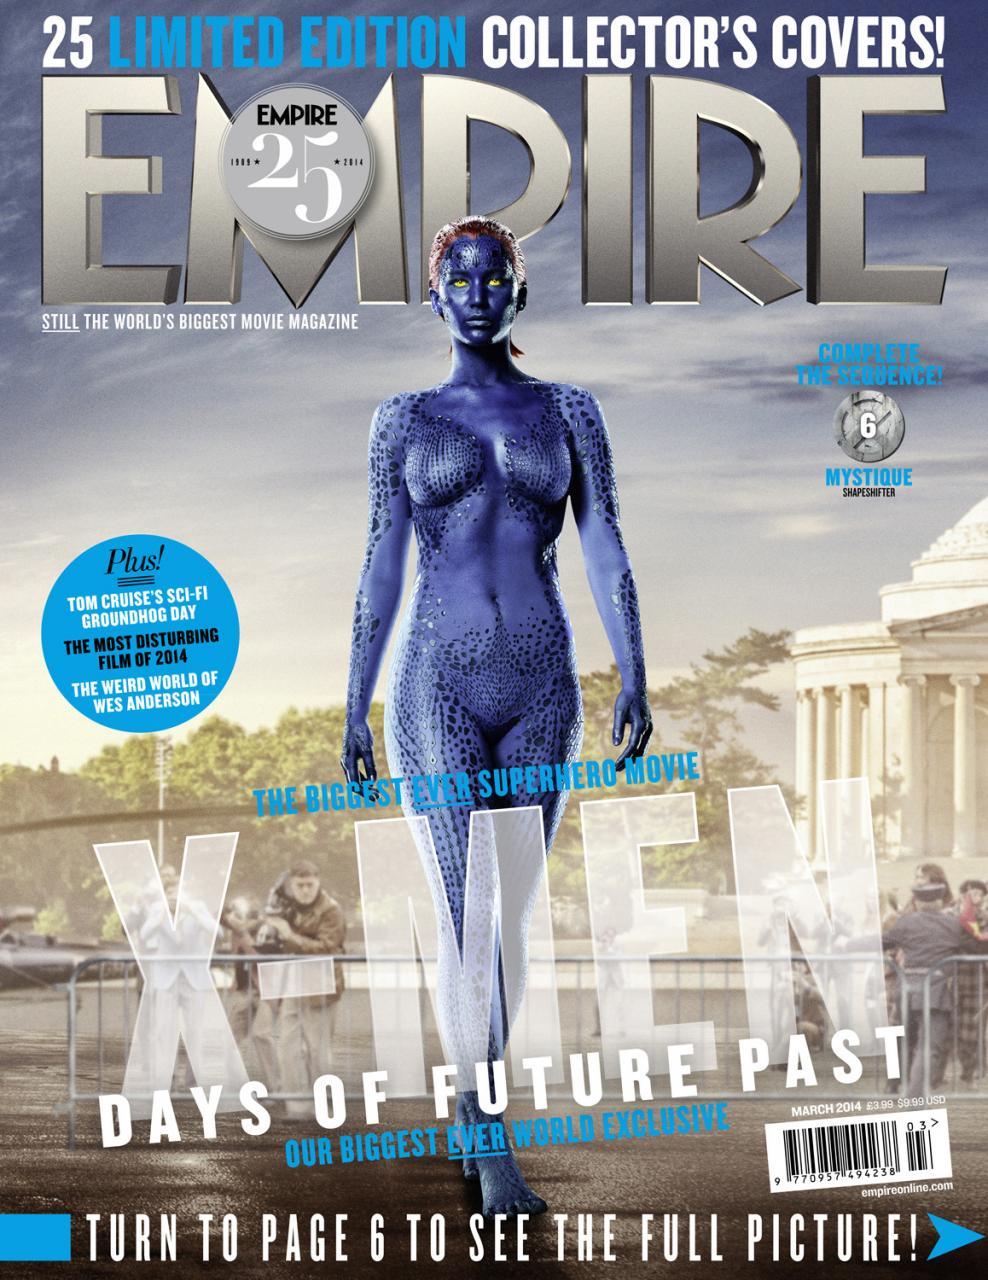 X-MEN DAYS OF FUTURE PAST Empire Magazine Covers  (11)